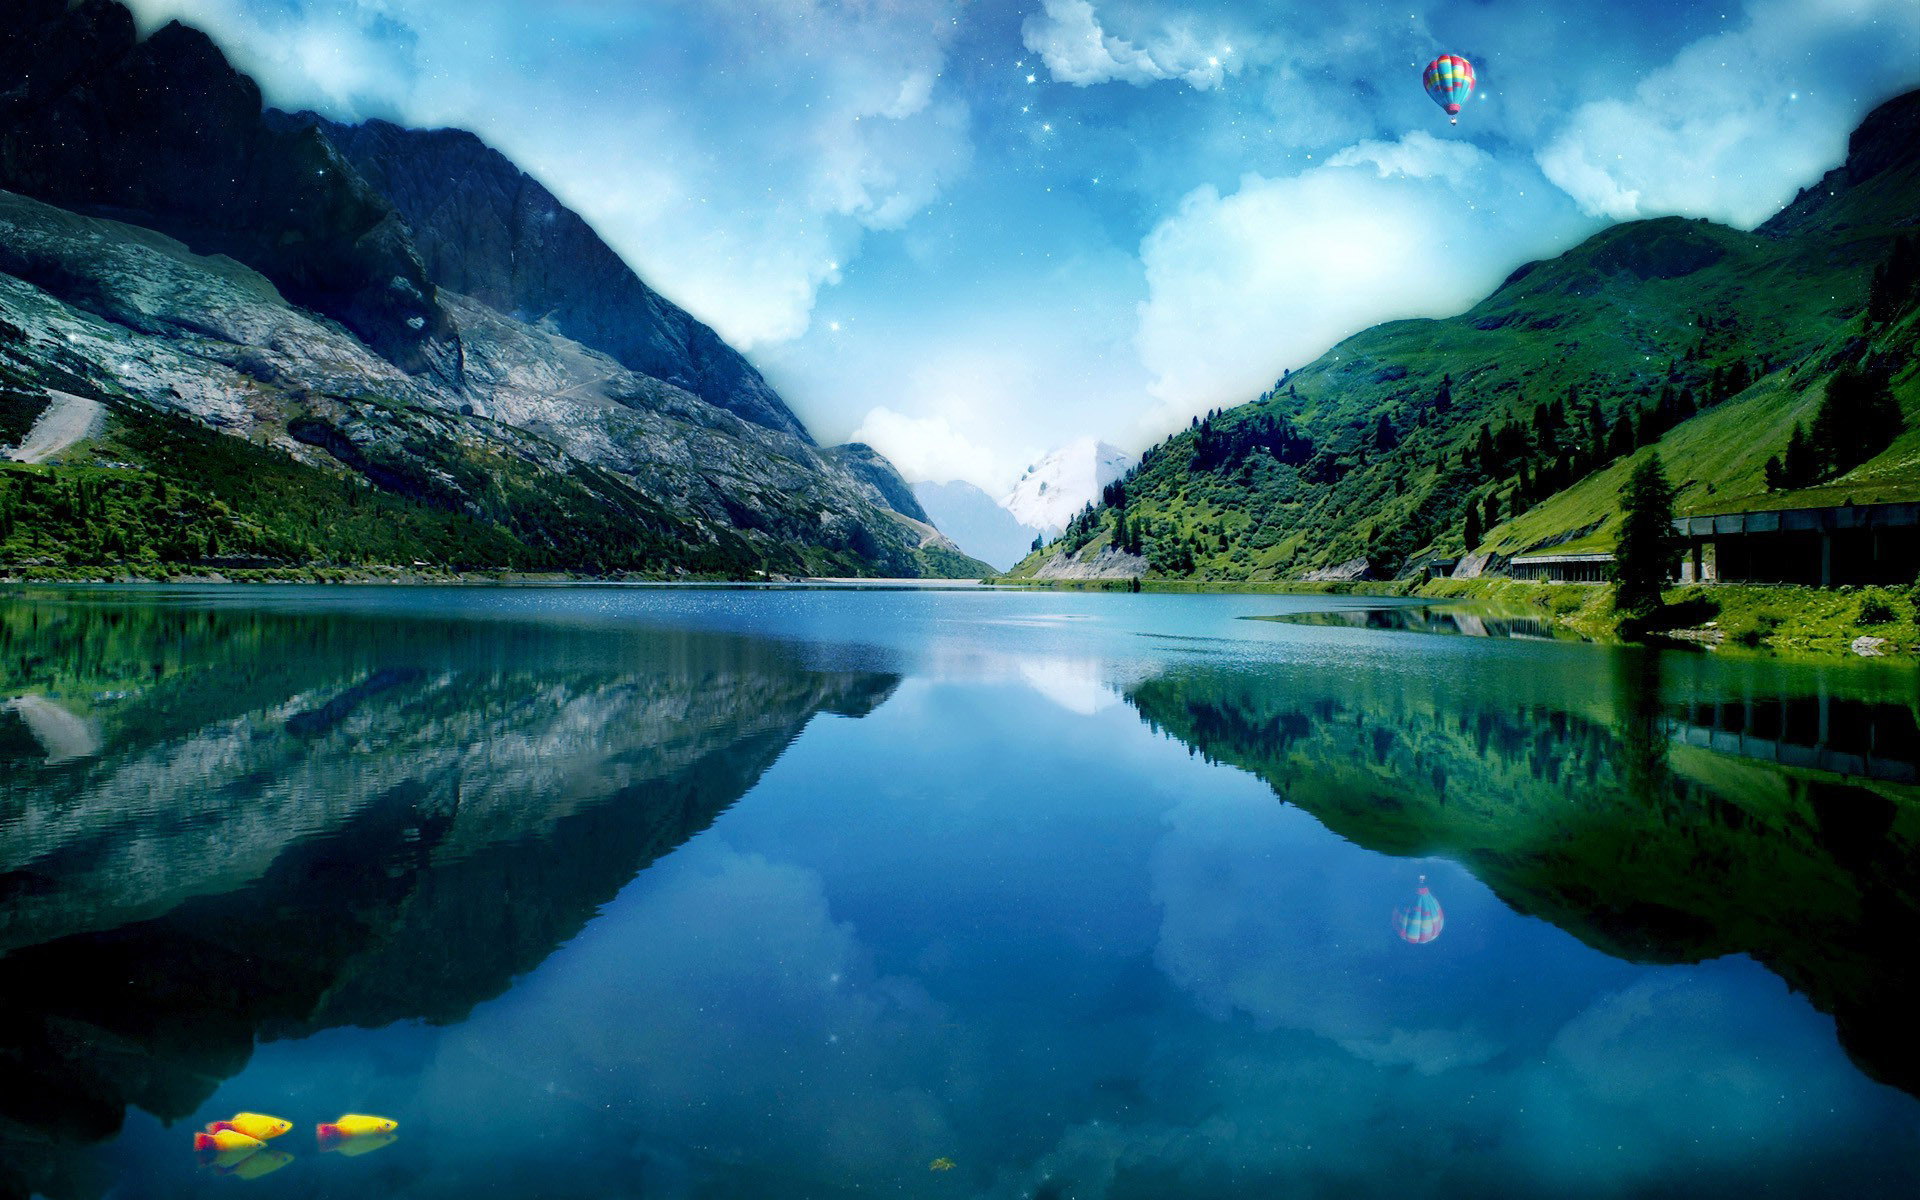 Lake Mountain Reflection Minimalism Wallpapers Hd: [40+] Mountain Lake Wallpaper On WallpaperSafari